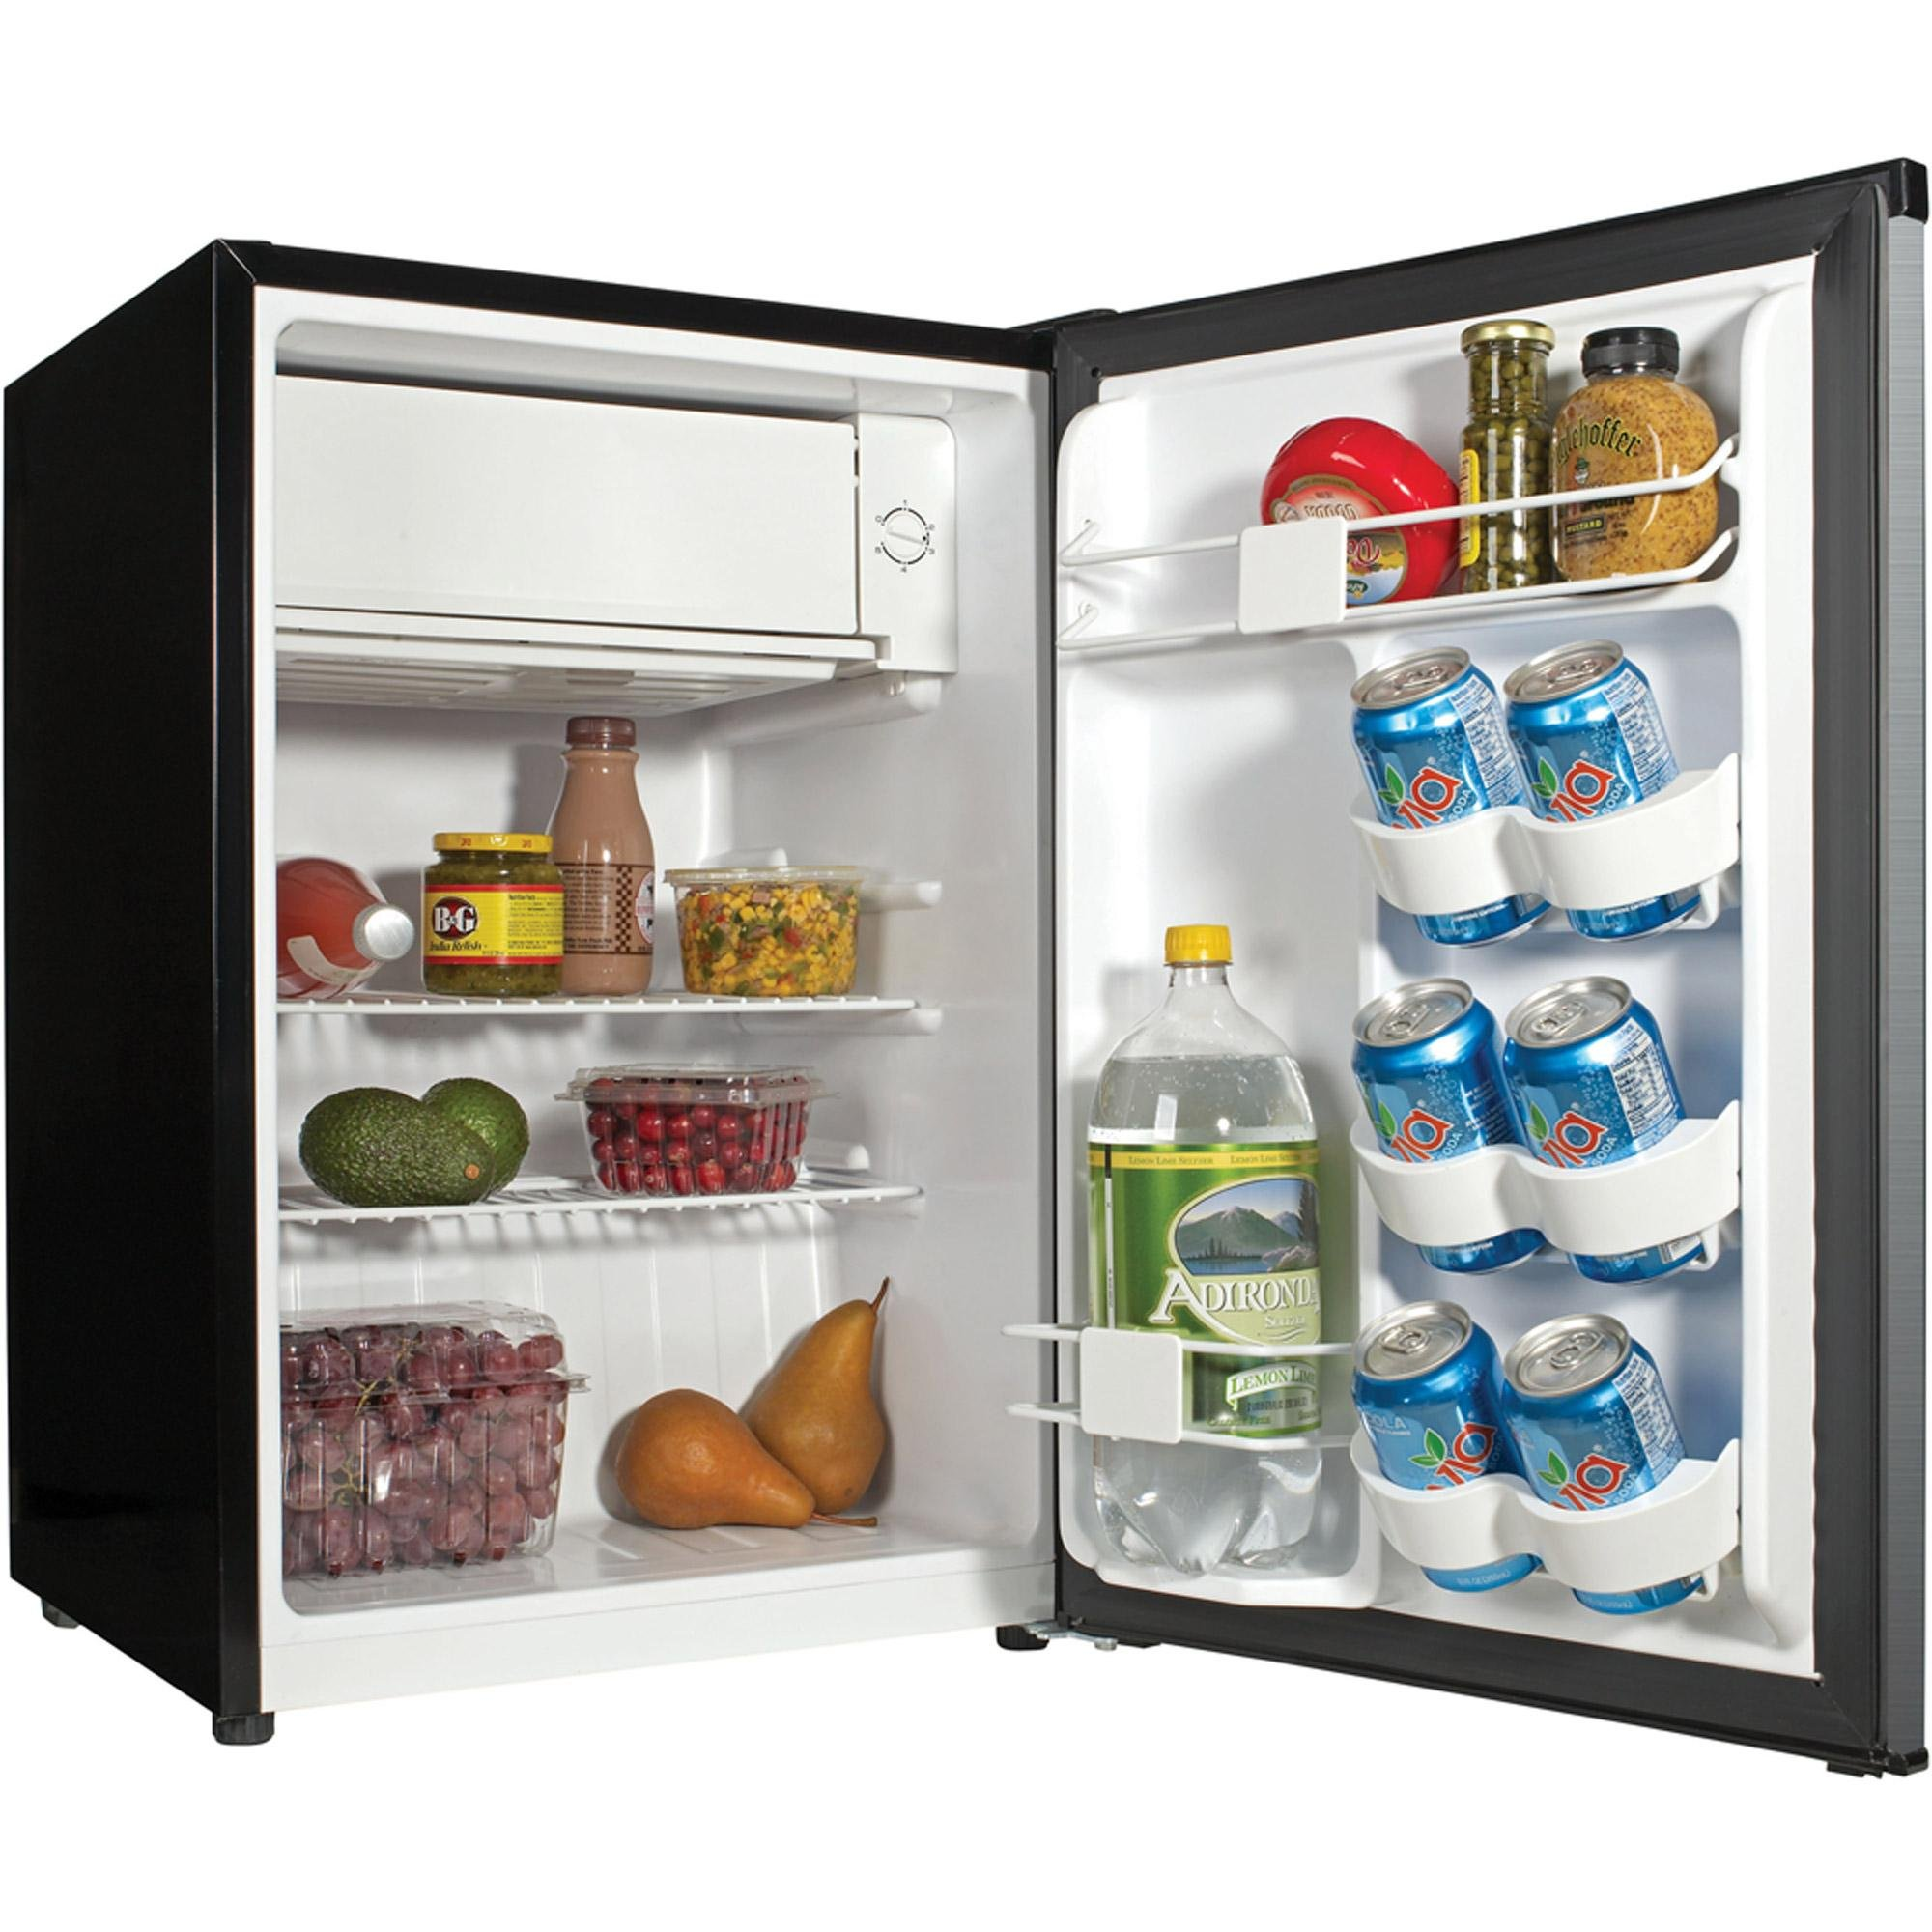 Haier 2.7 Cu. Ft. Mini-Refrigerator mini fridge refrigerator College School Food Dorm by Haier (Image #2)